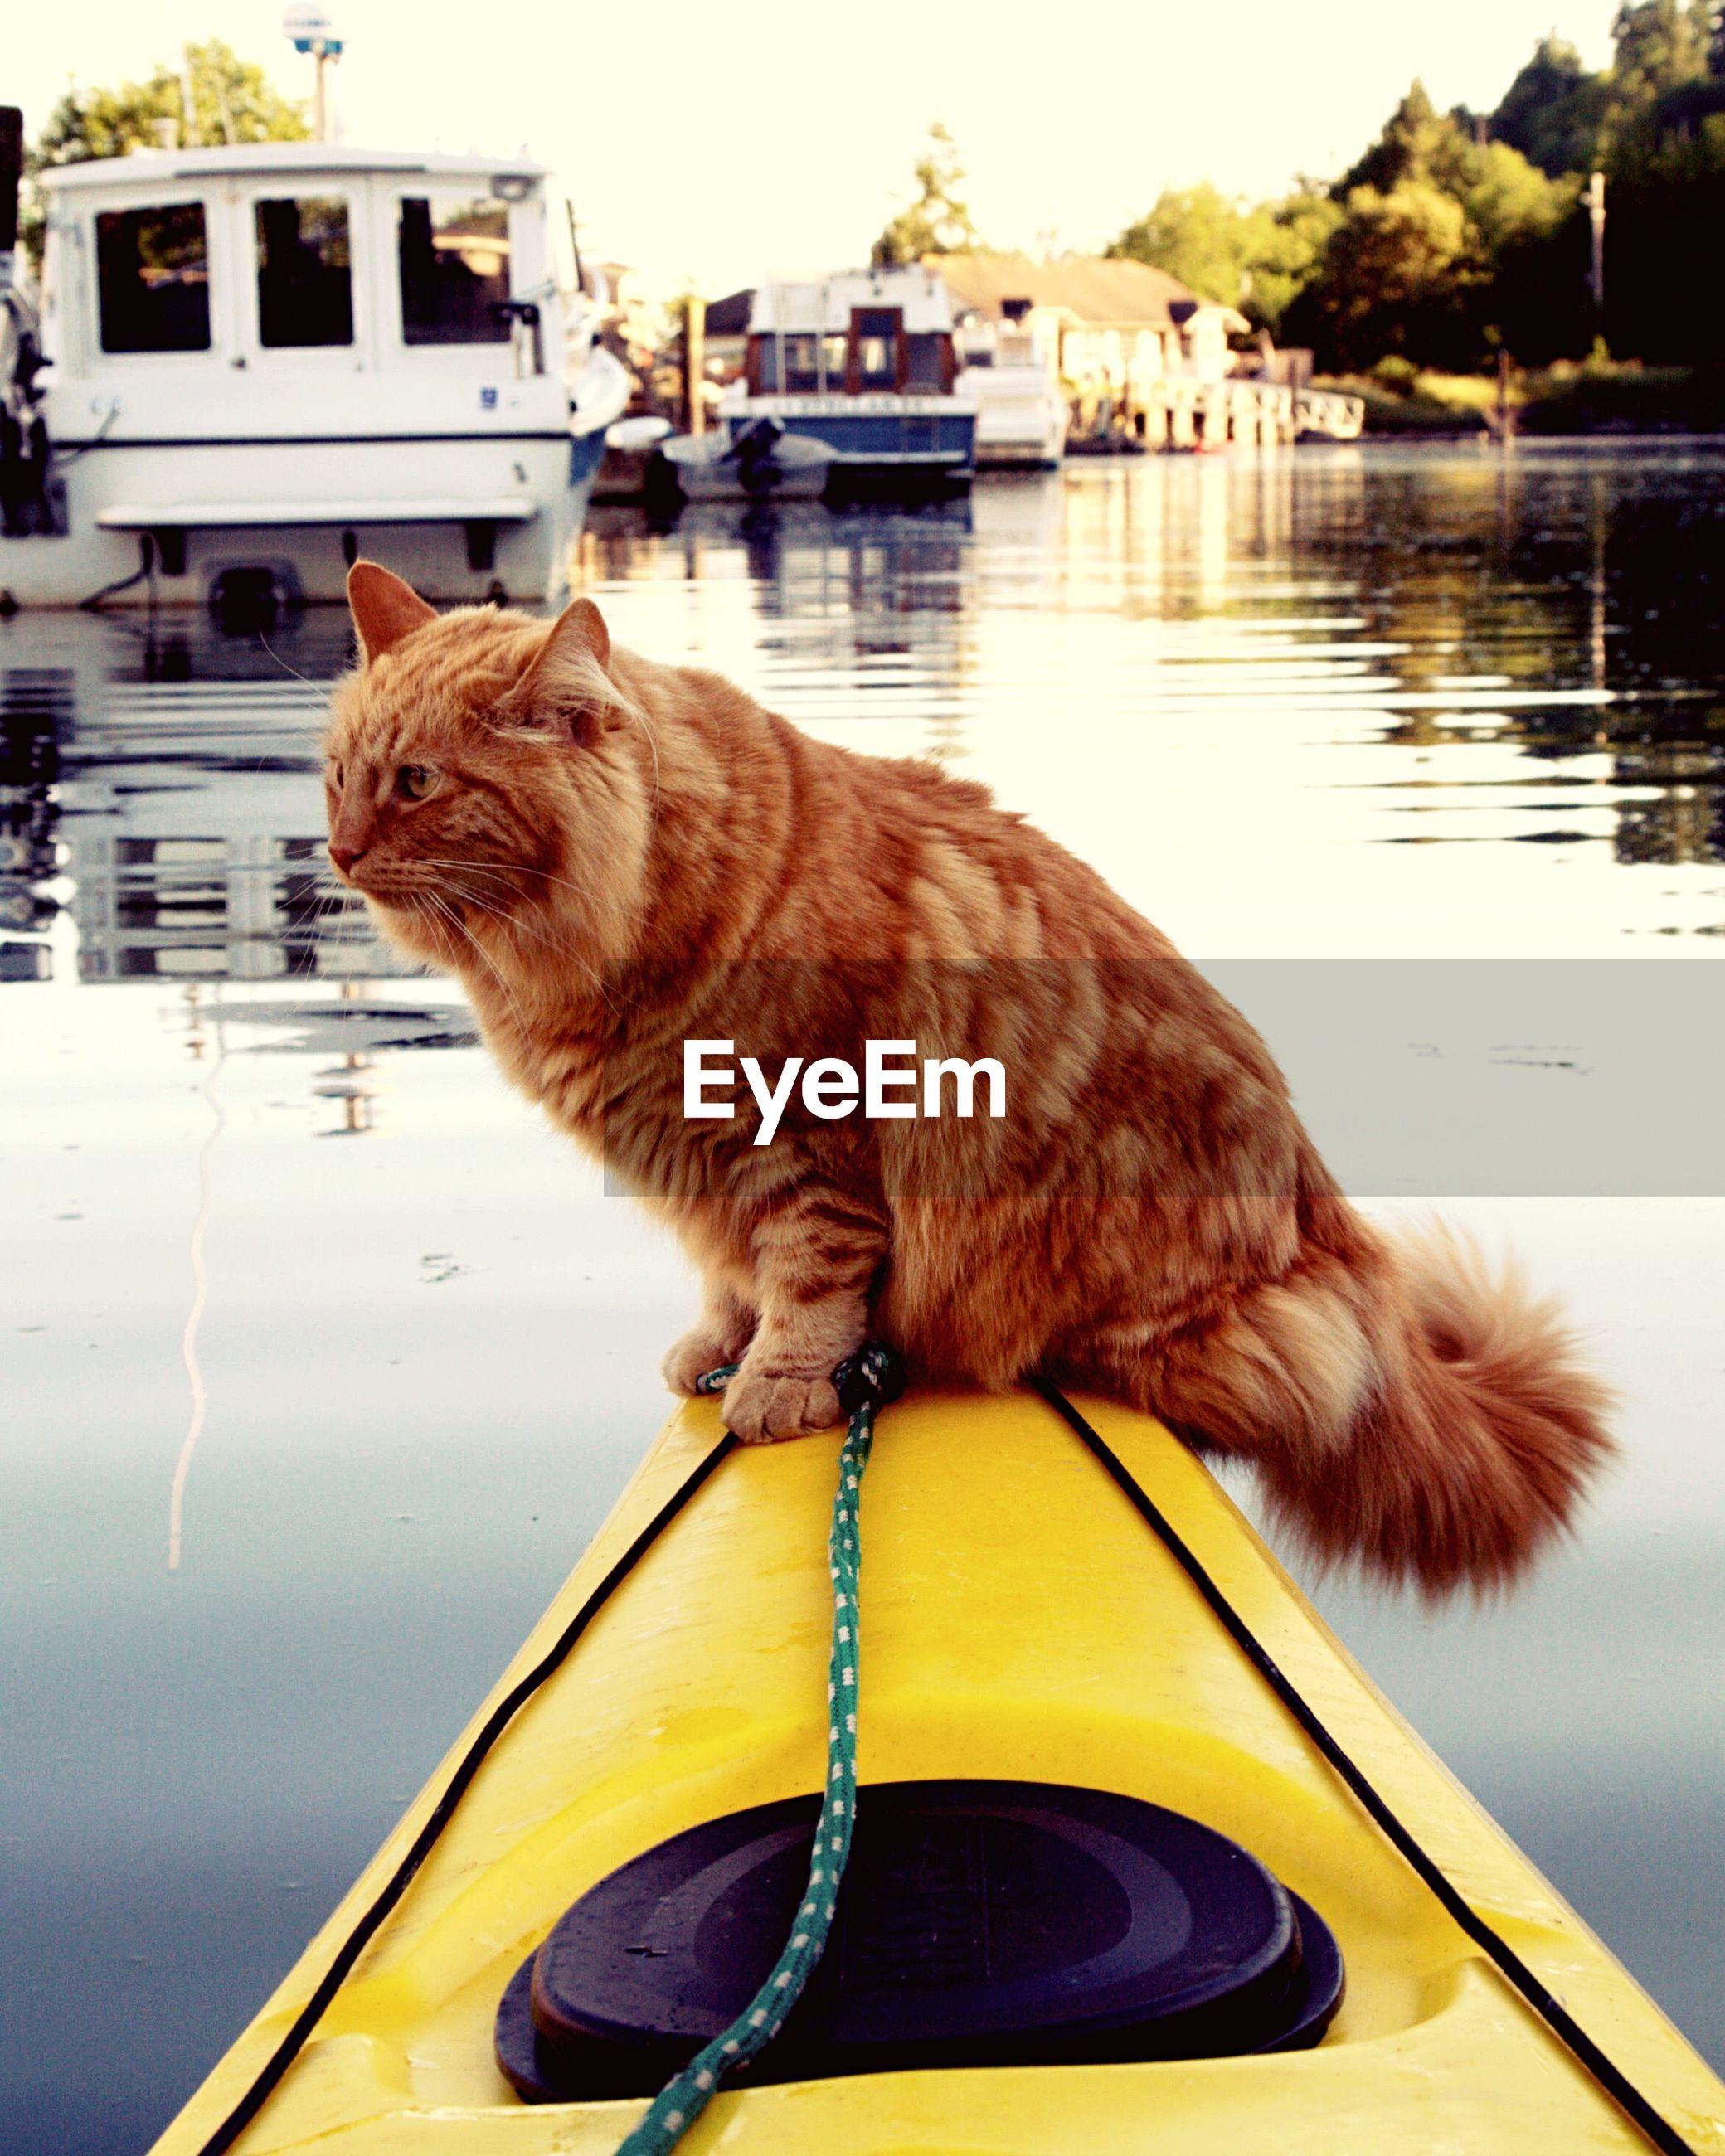 Cat sitting on kayak moored in river against sky